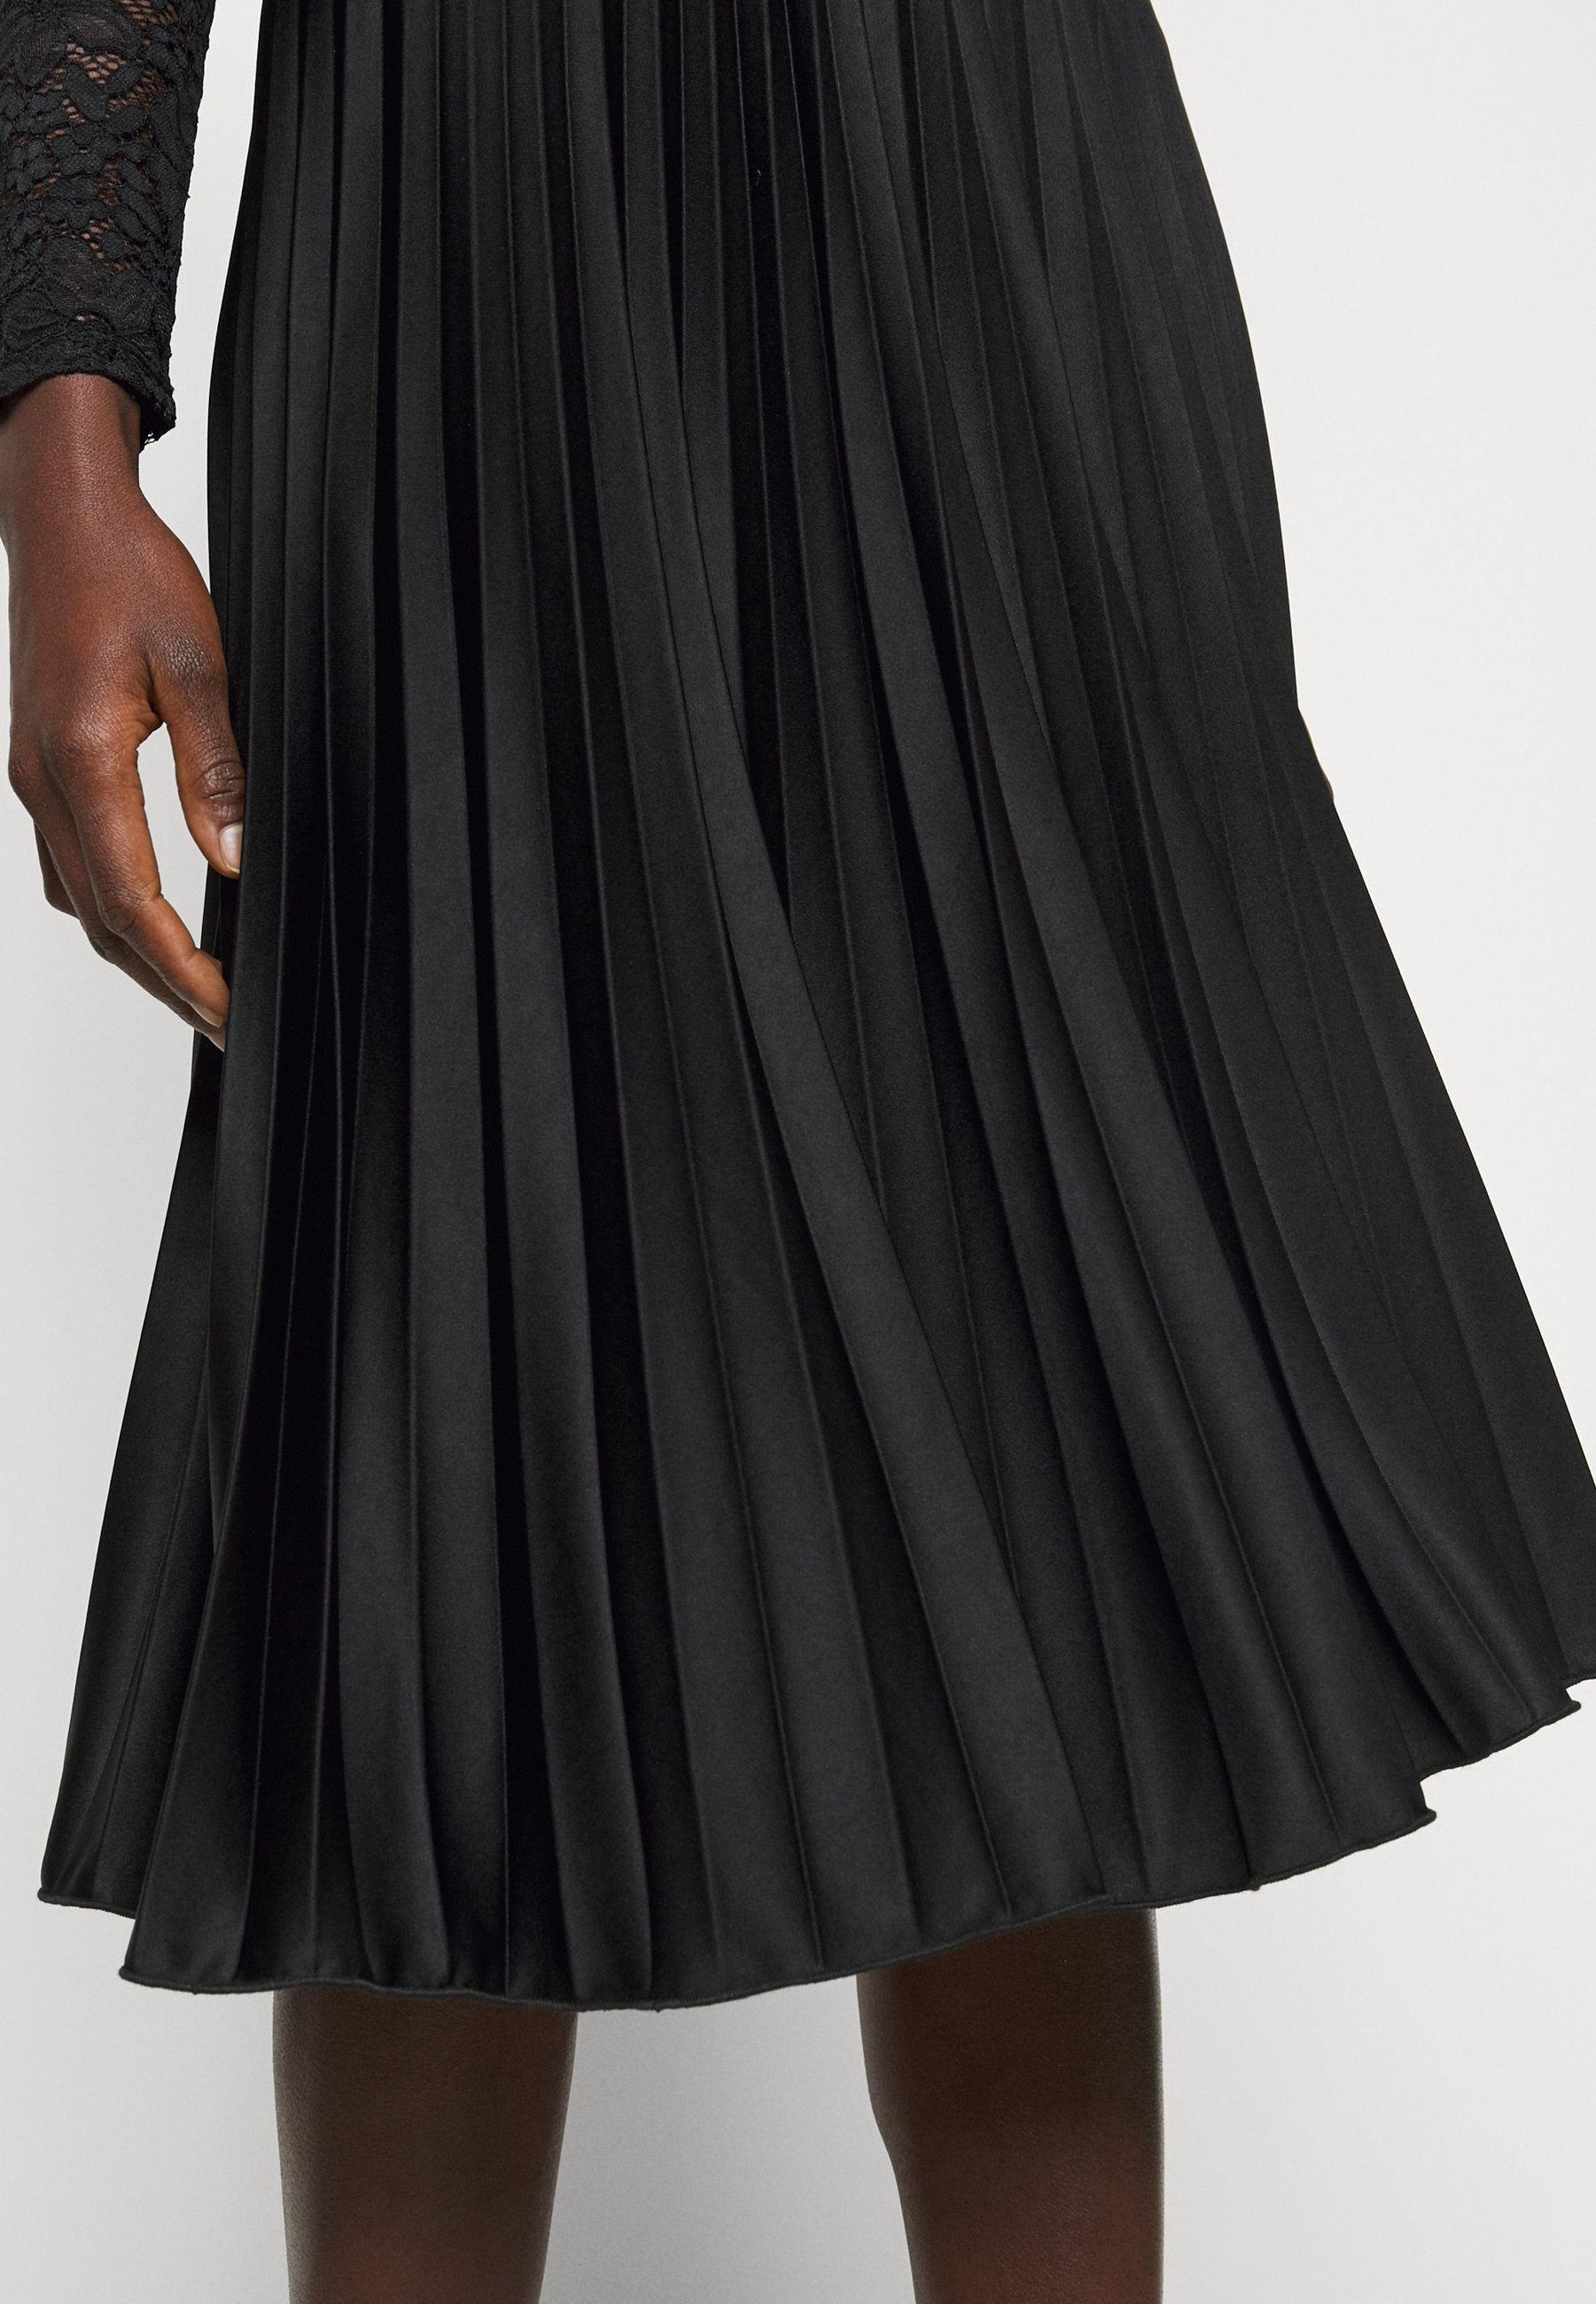 Femme PLEAT SKIRT - Jupe trapèze